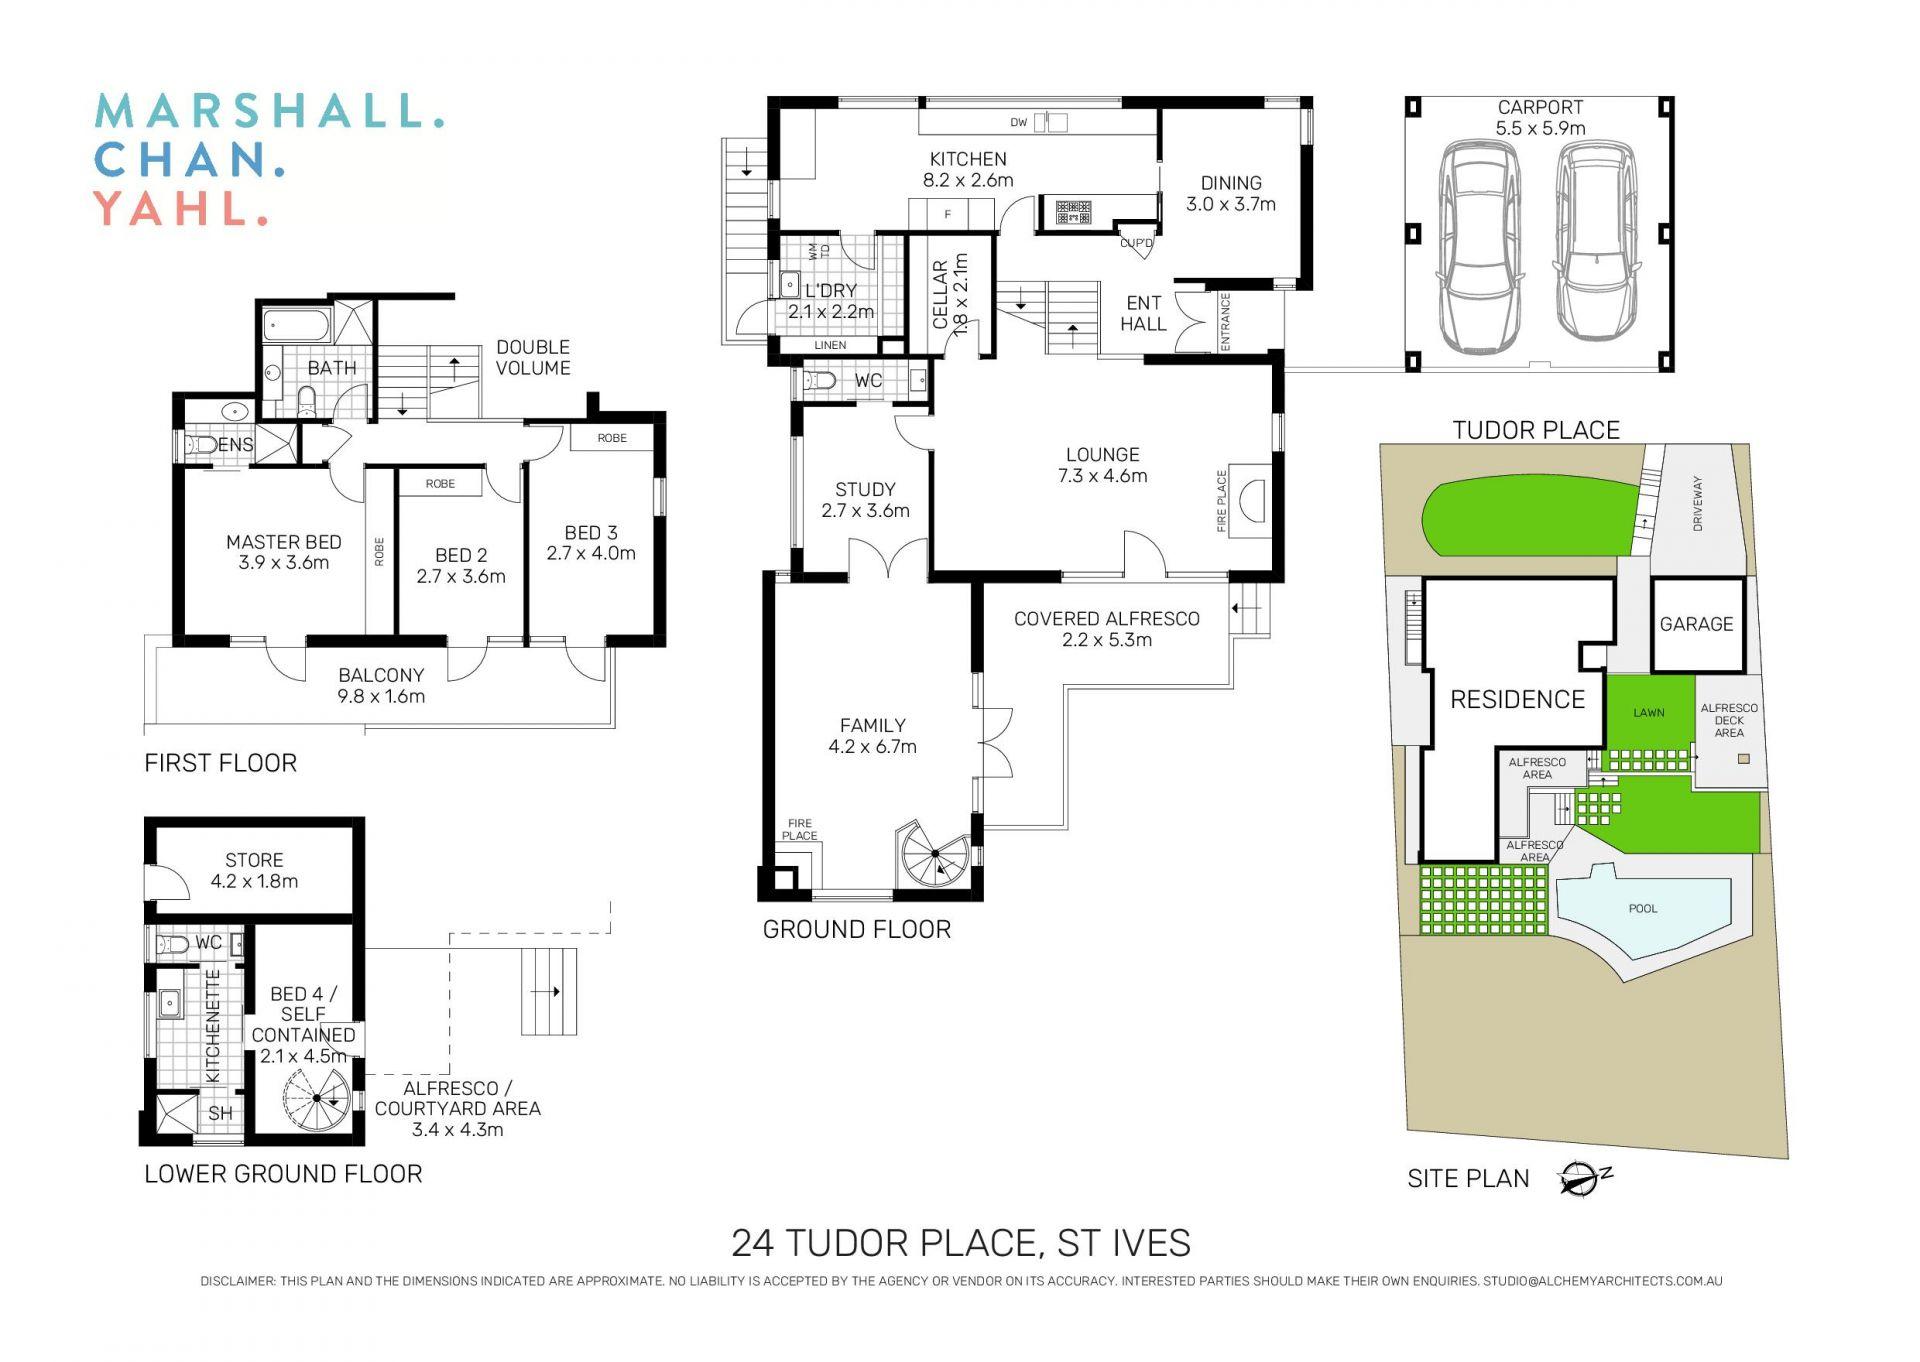 24 Tudor Place St Ives 2075